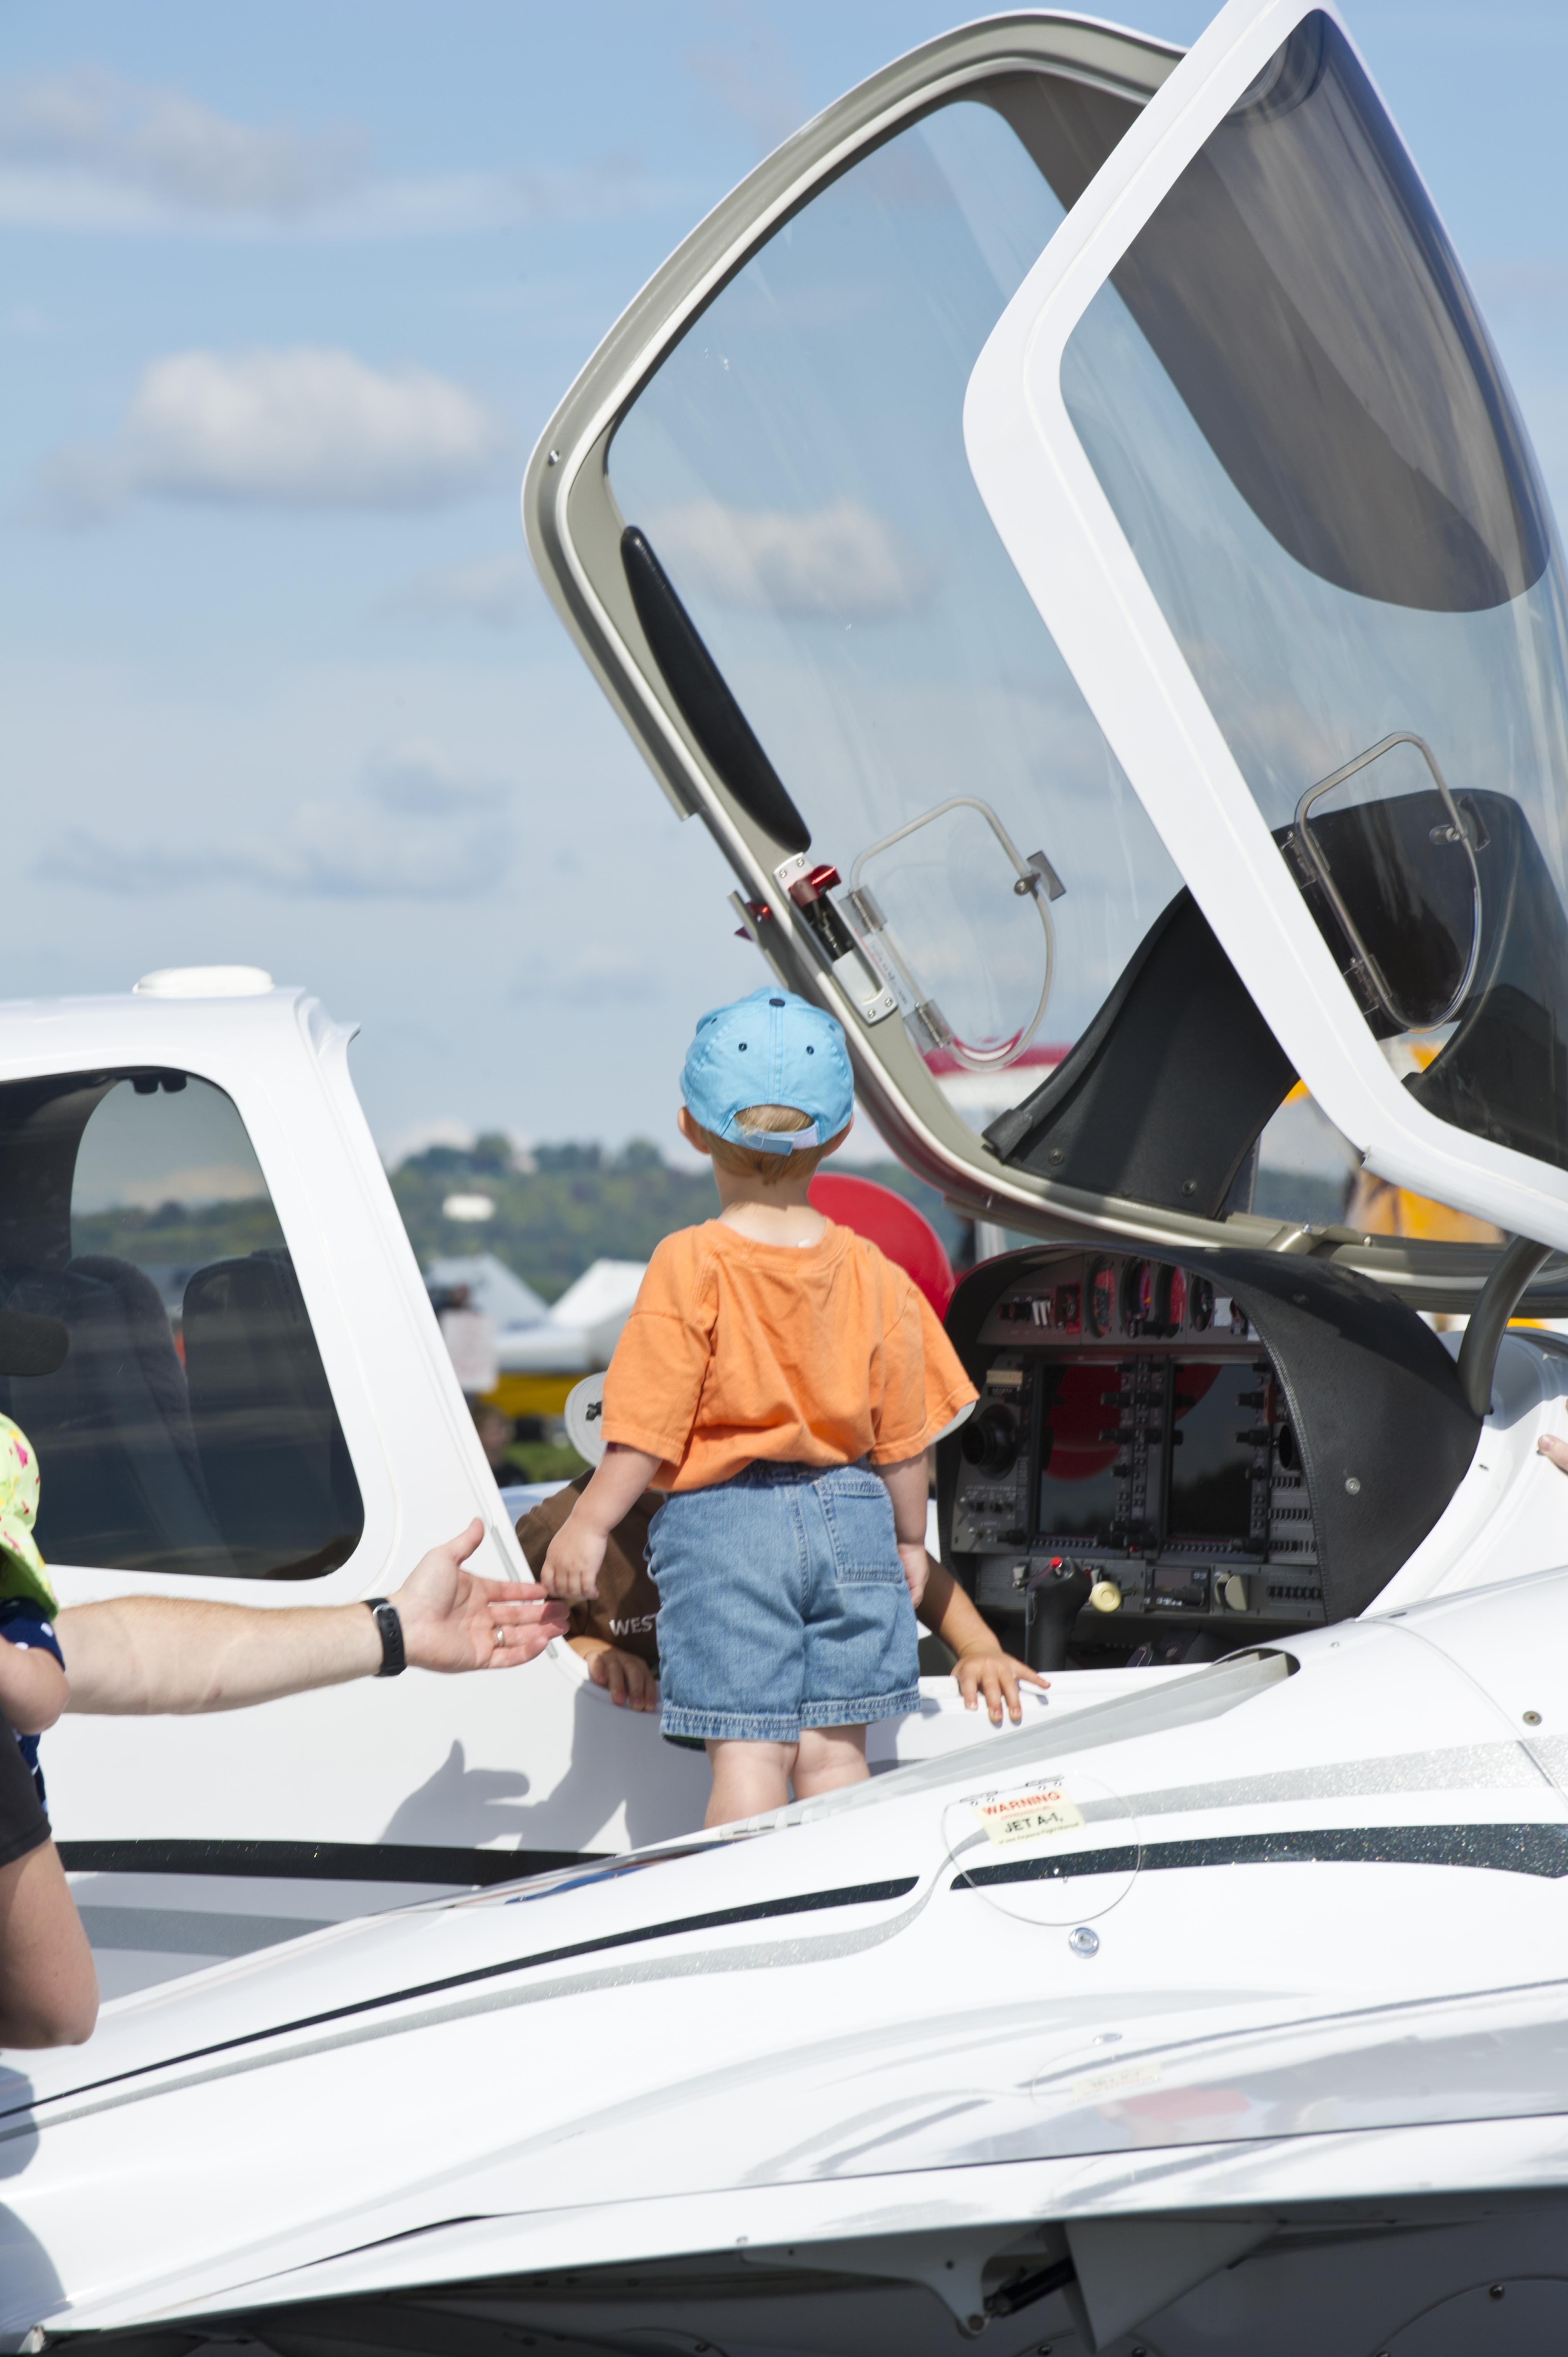 Kid in Plane